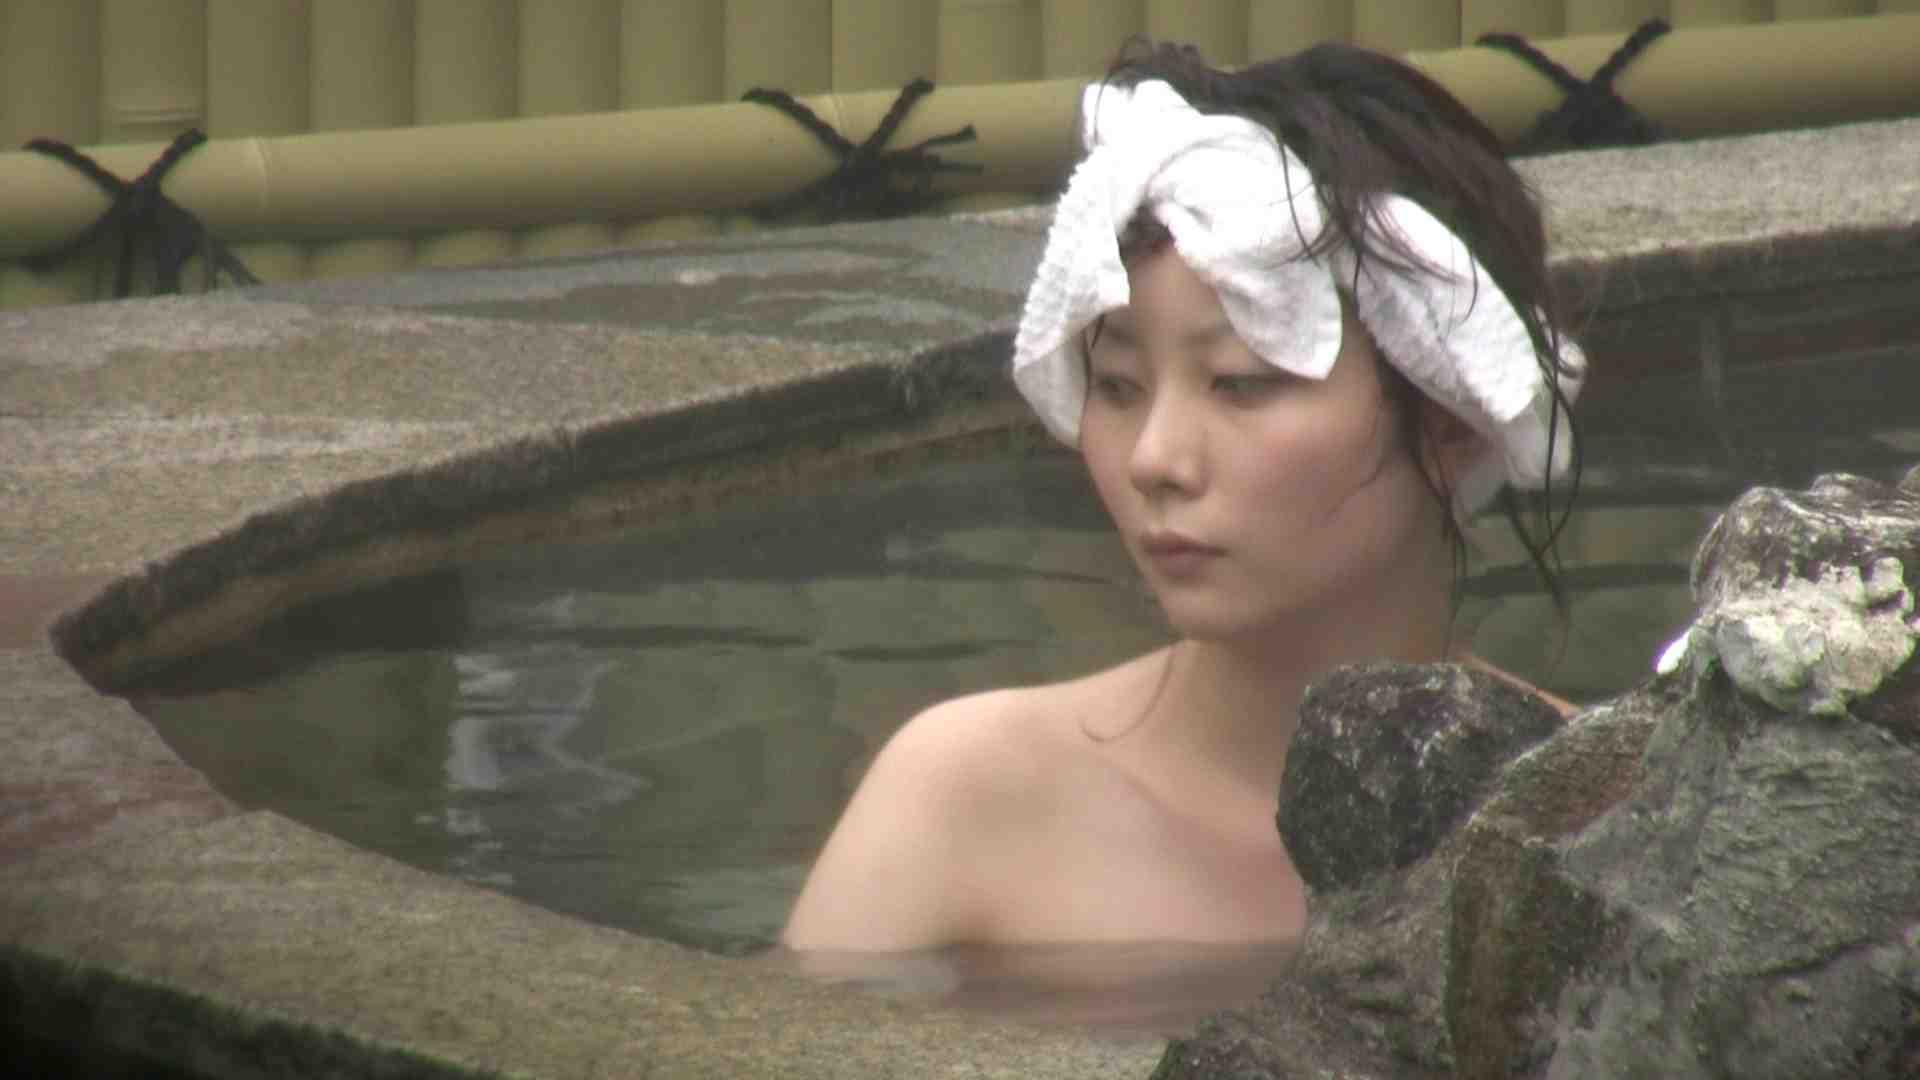 Aquaな露天風呂Vol.147 綺麗なOLたち アダルト動画キャプチャ 102枚 38